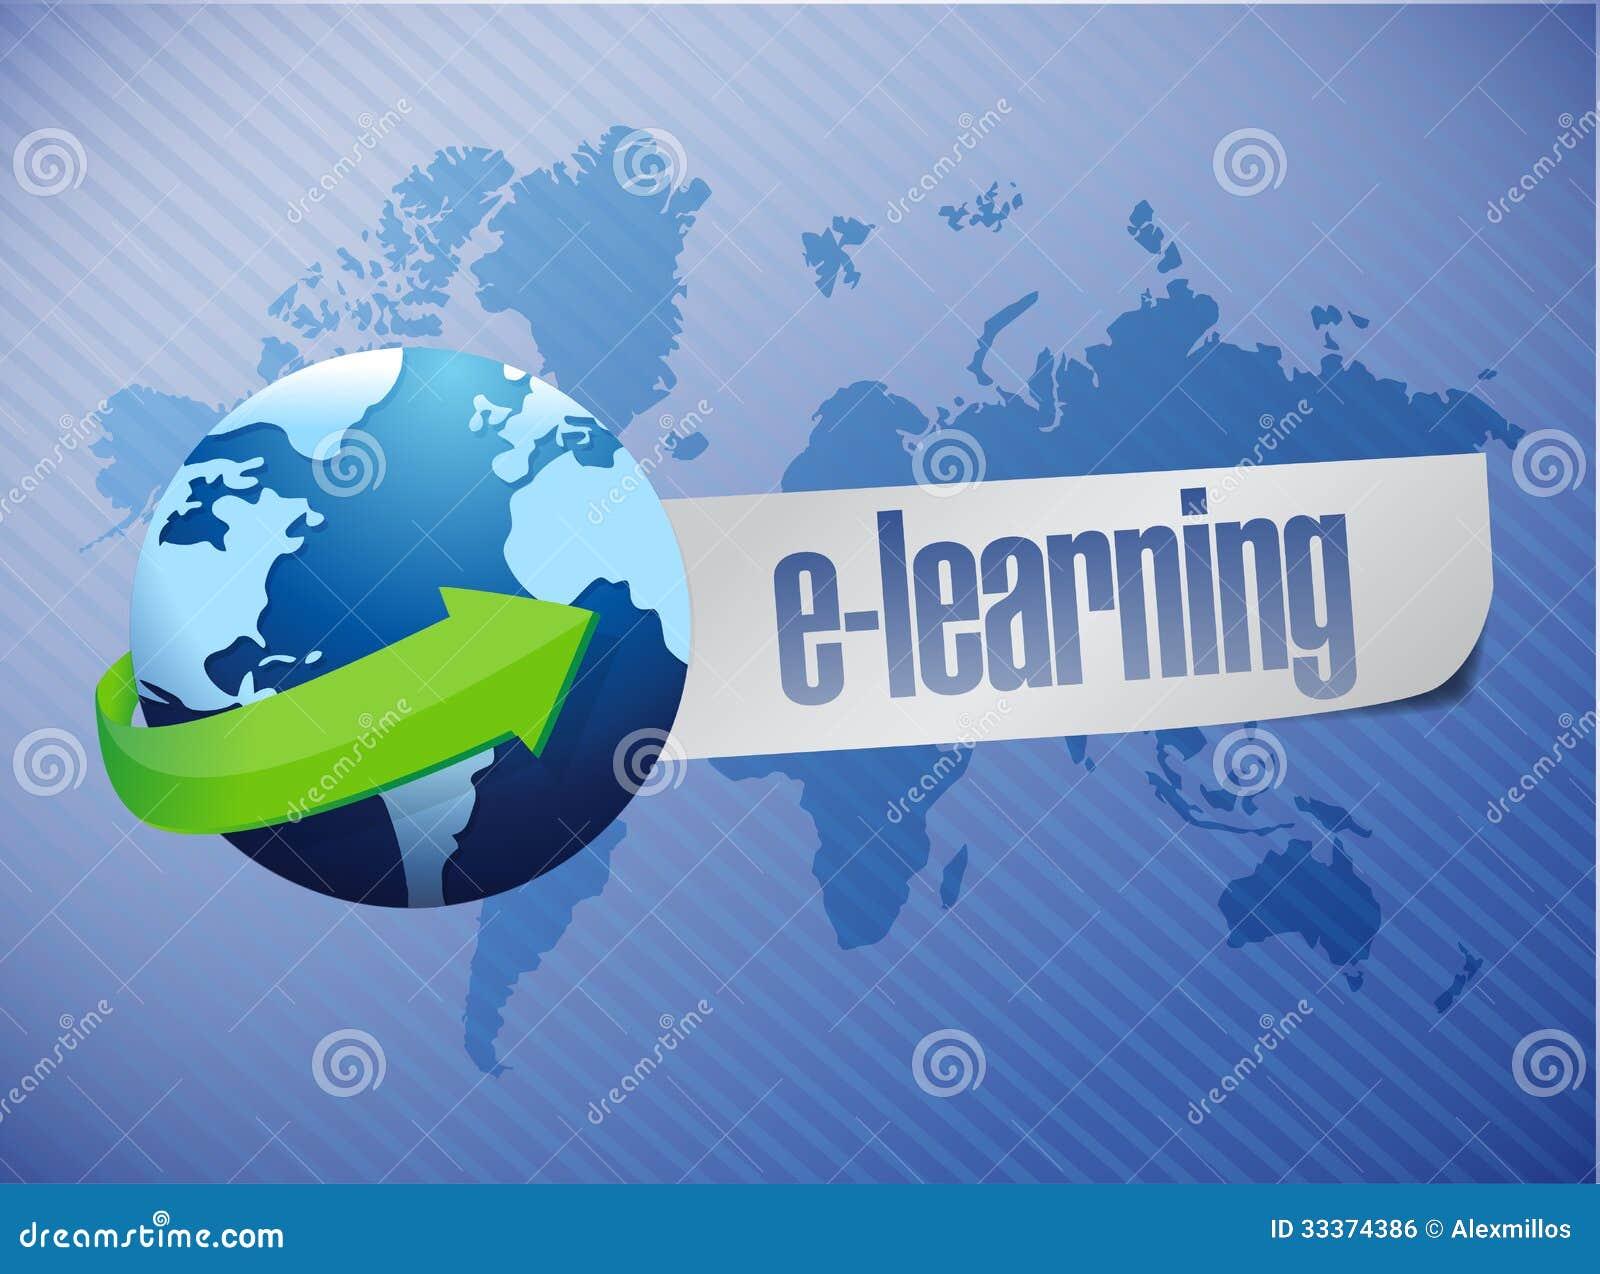 Home Design Program Online Free E Learning Globe Concept Illustration Design Royalty Free